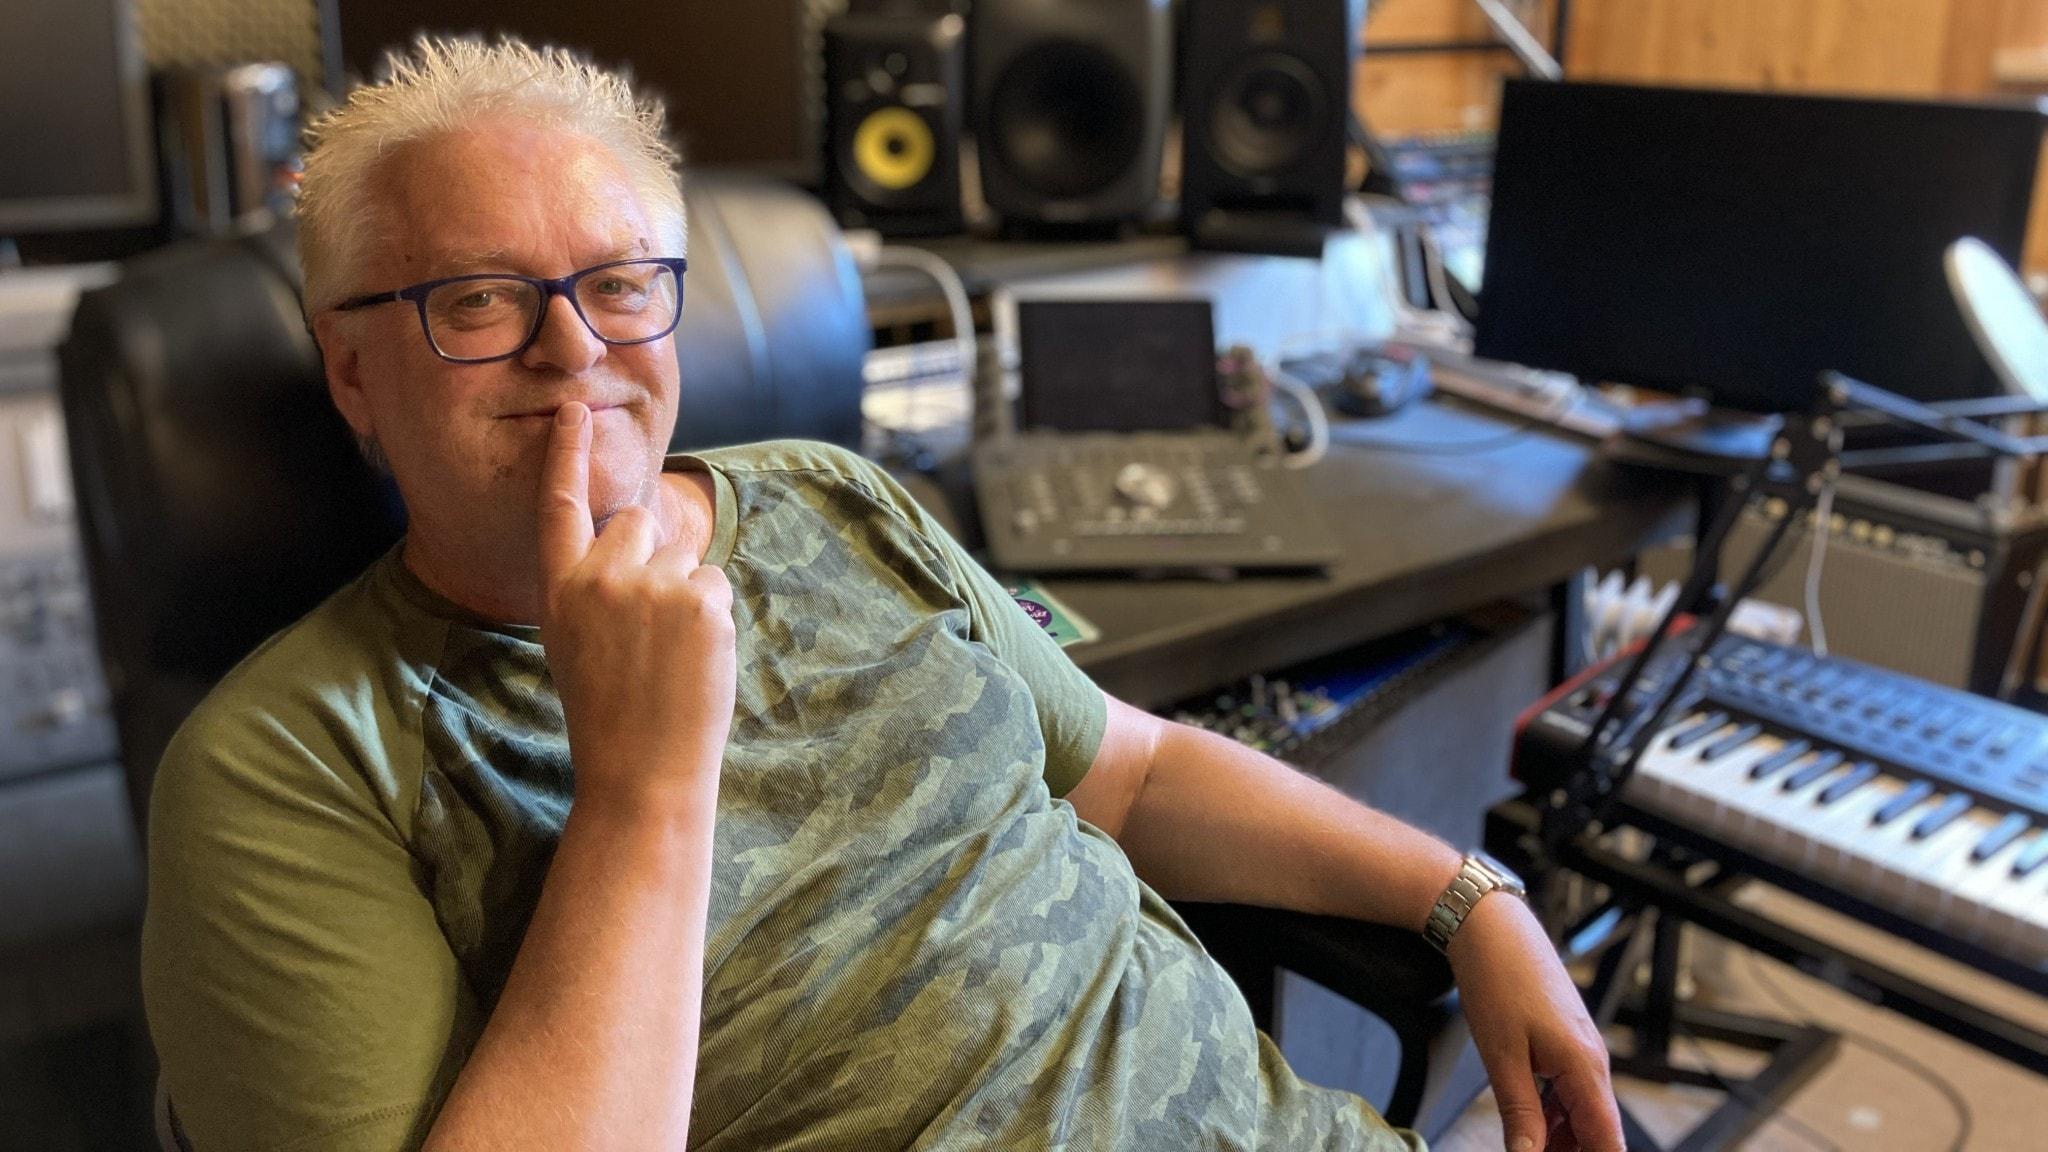 Nick Borgen sitter i sin musikstudio. Instrument syns i bakgrunden.